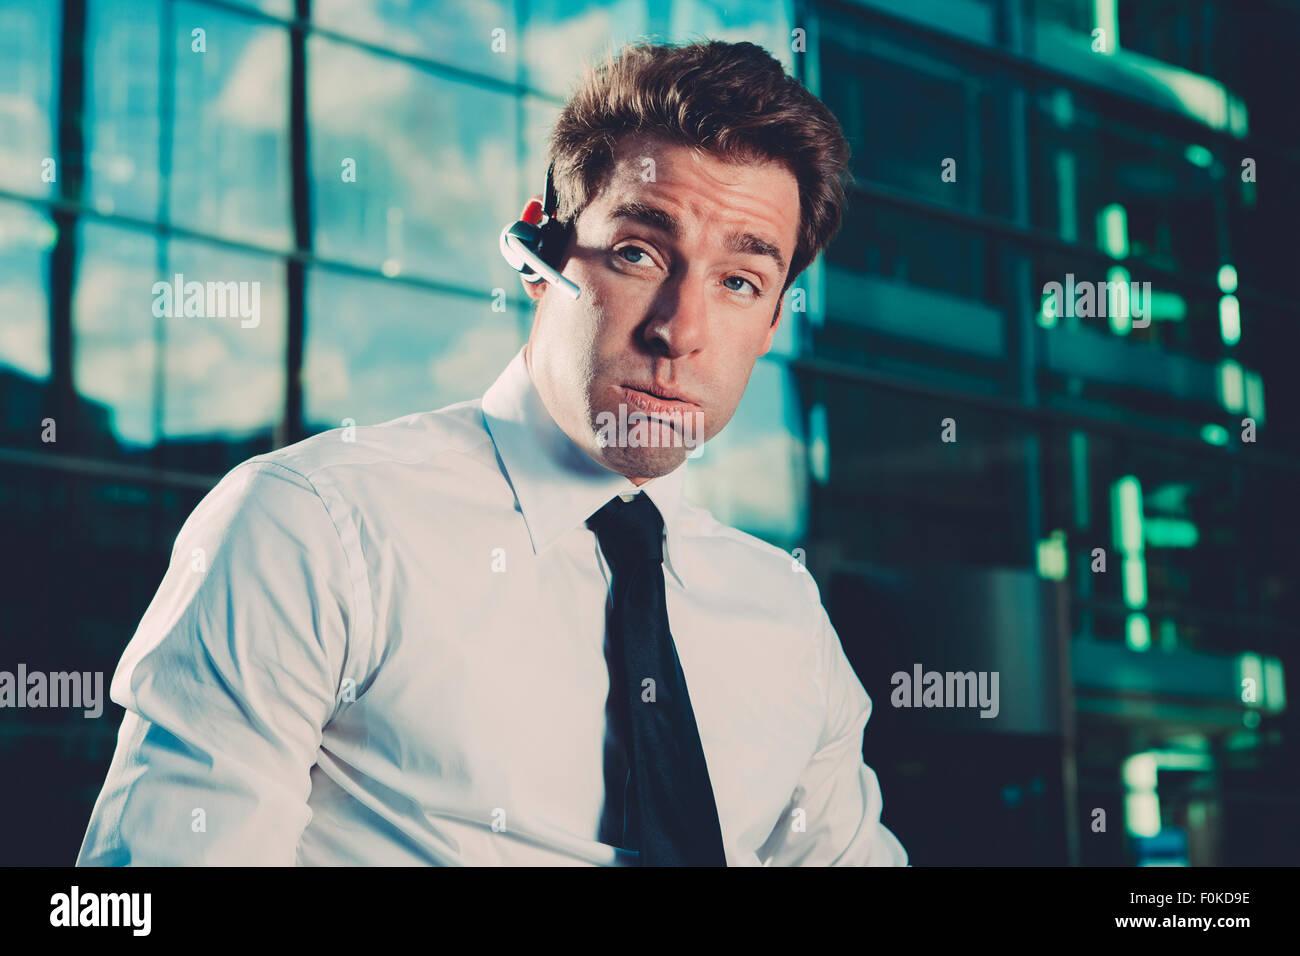 Geschäftsmann, tragen Bluetooth-Gerät vor Bürogebäude Stockbild